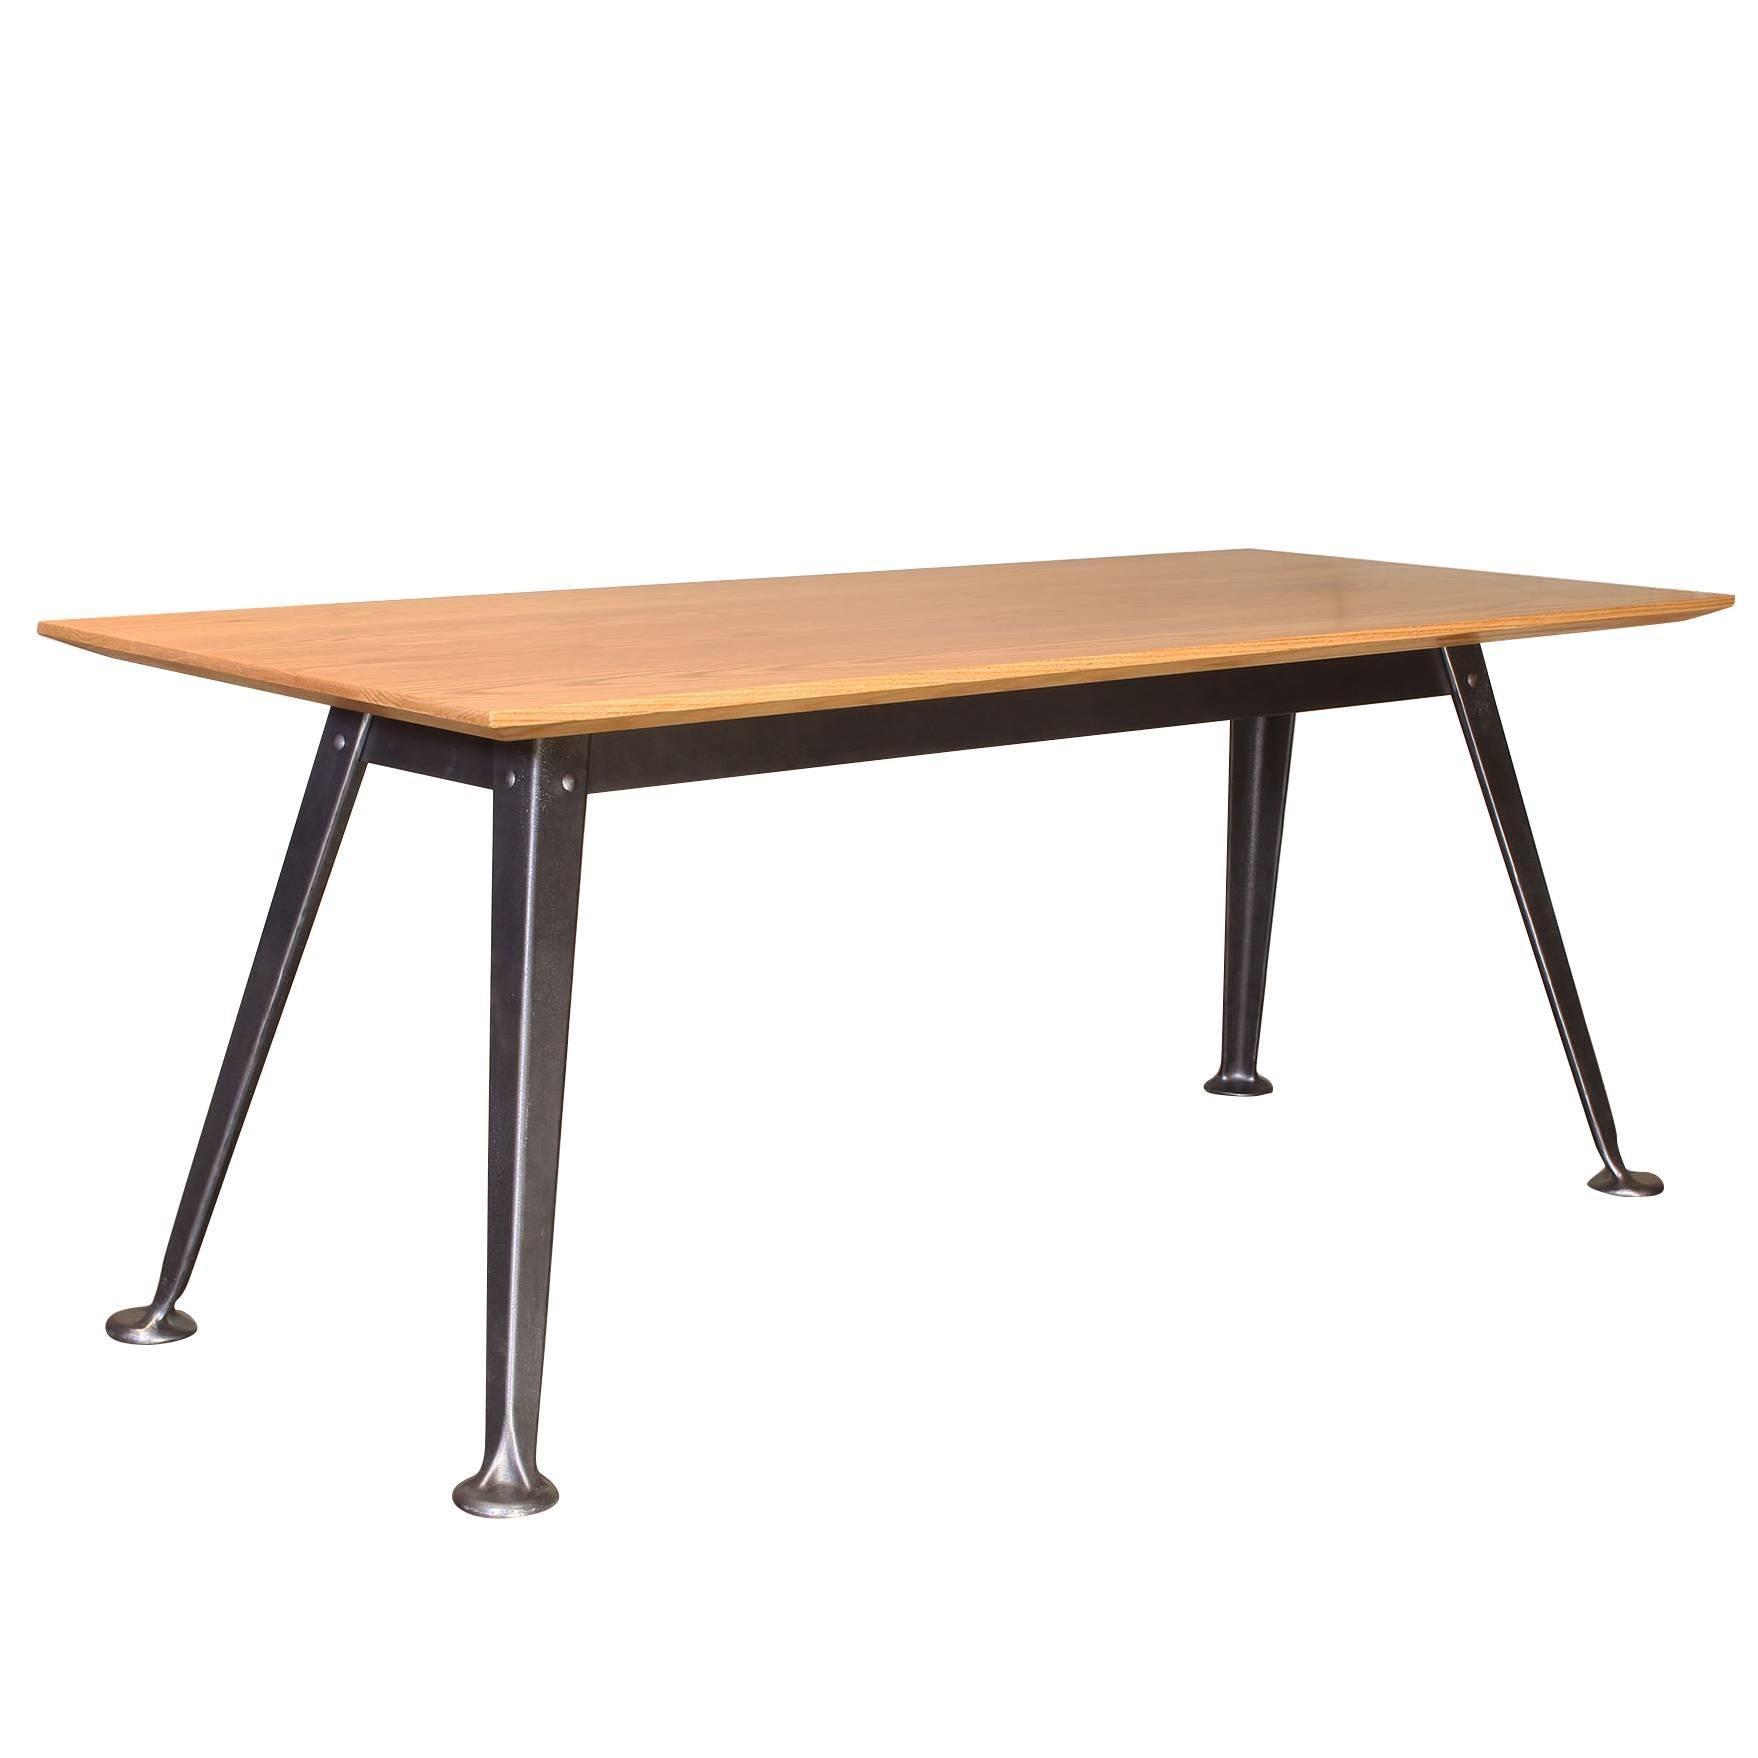 Bespoke Industrial Oak and Cast Iron Splay-Leg Table